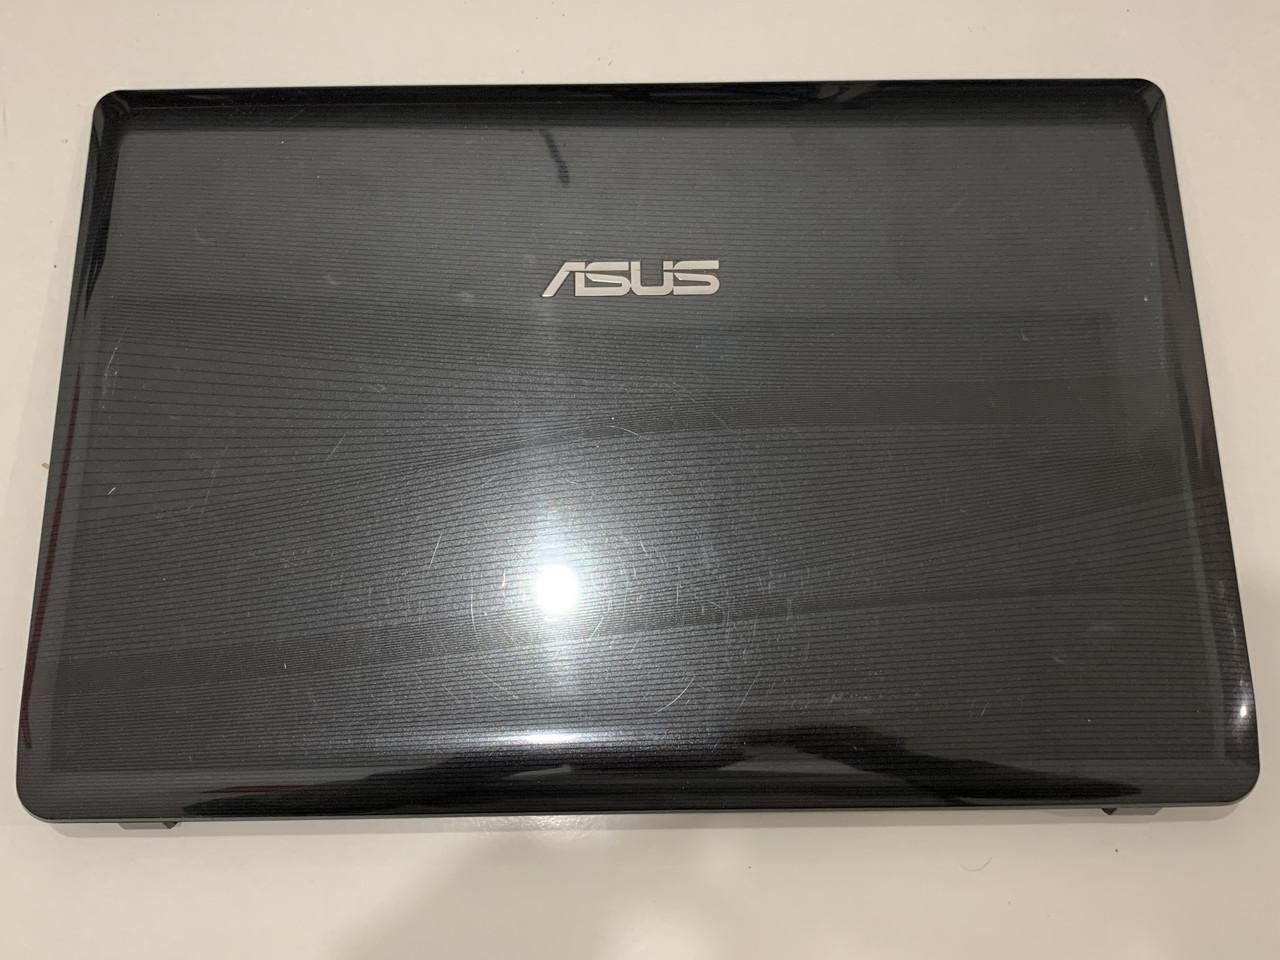 Запчасти для ноутбука Asus K52D - Крышка матрицы 13GNXM13P011-5